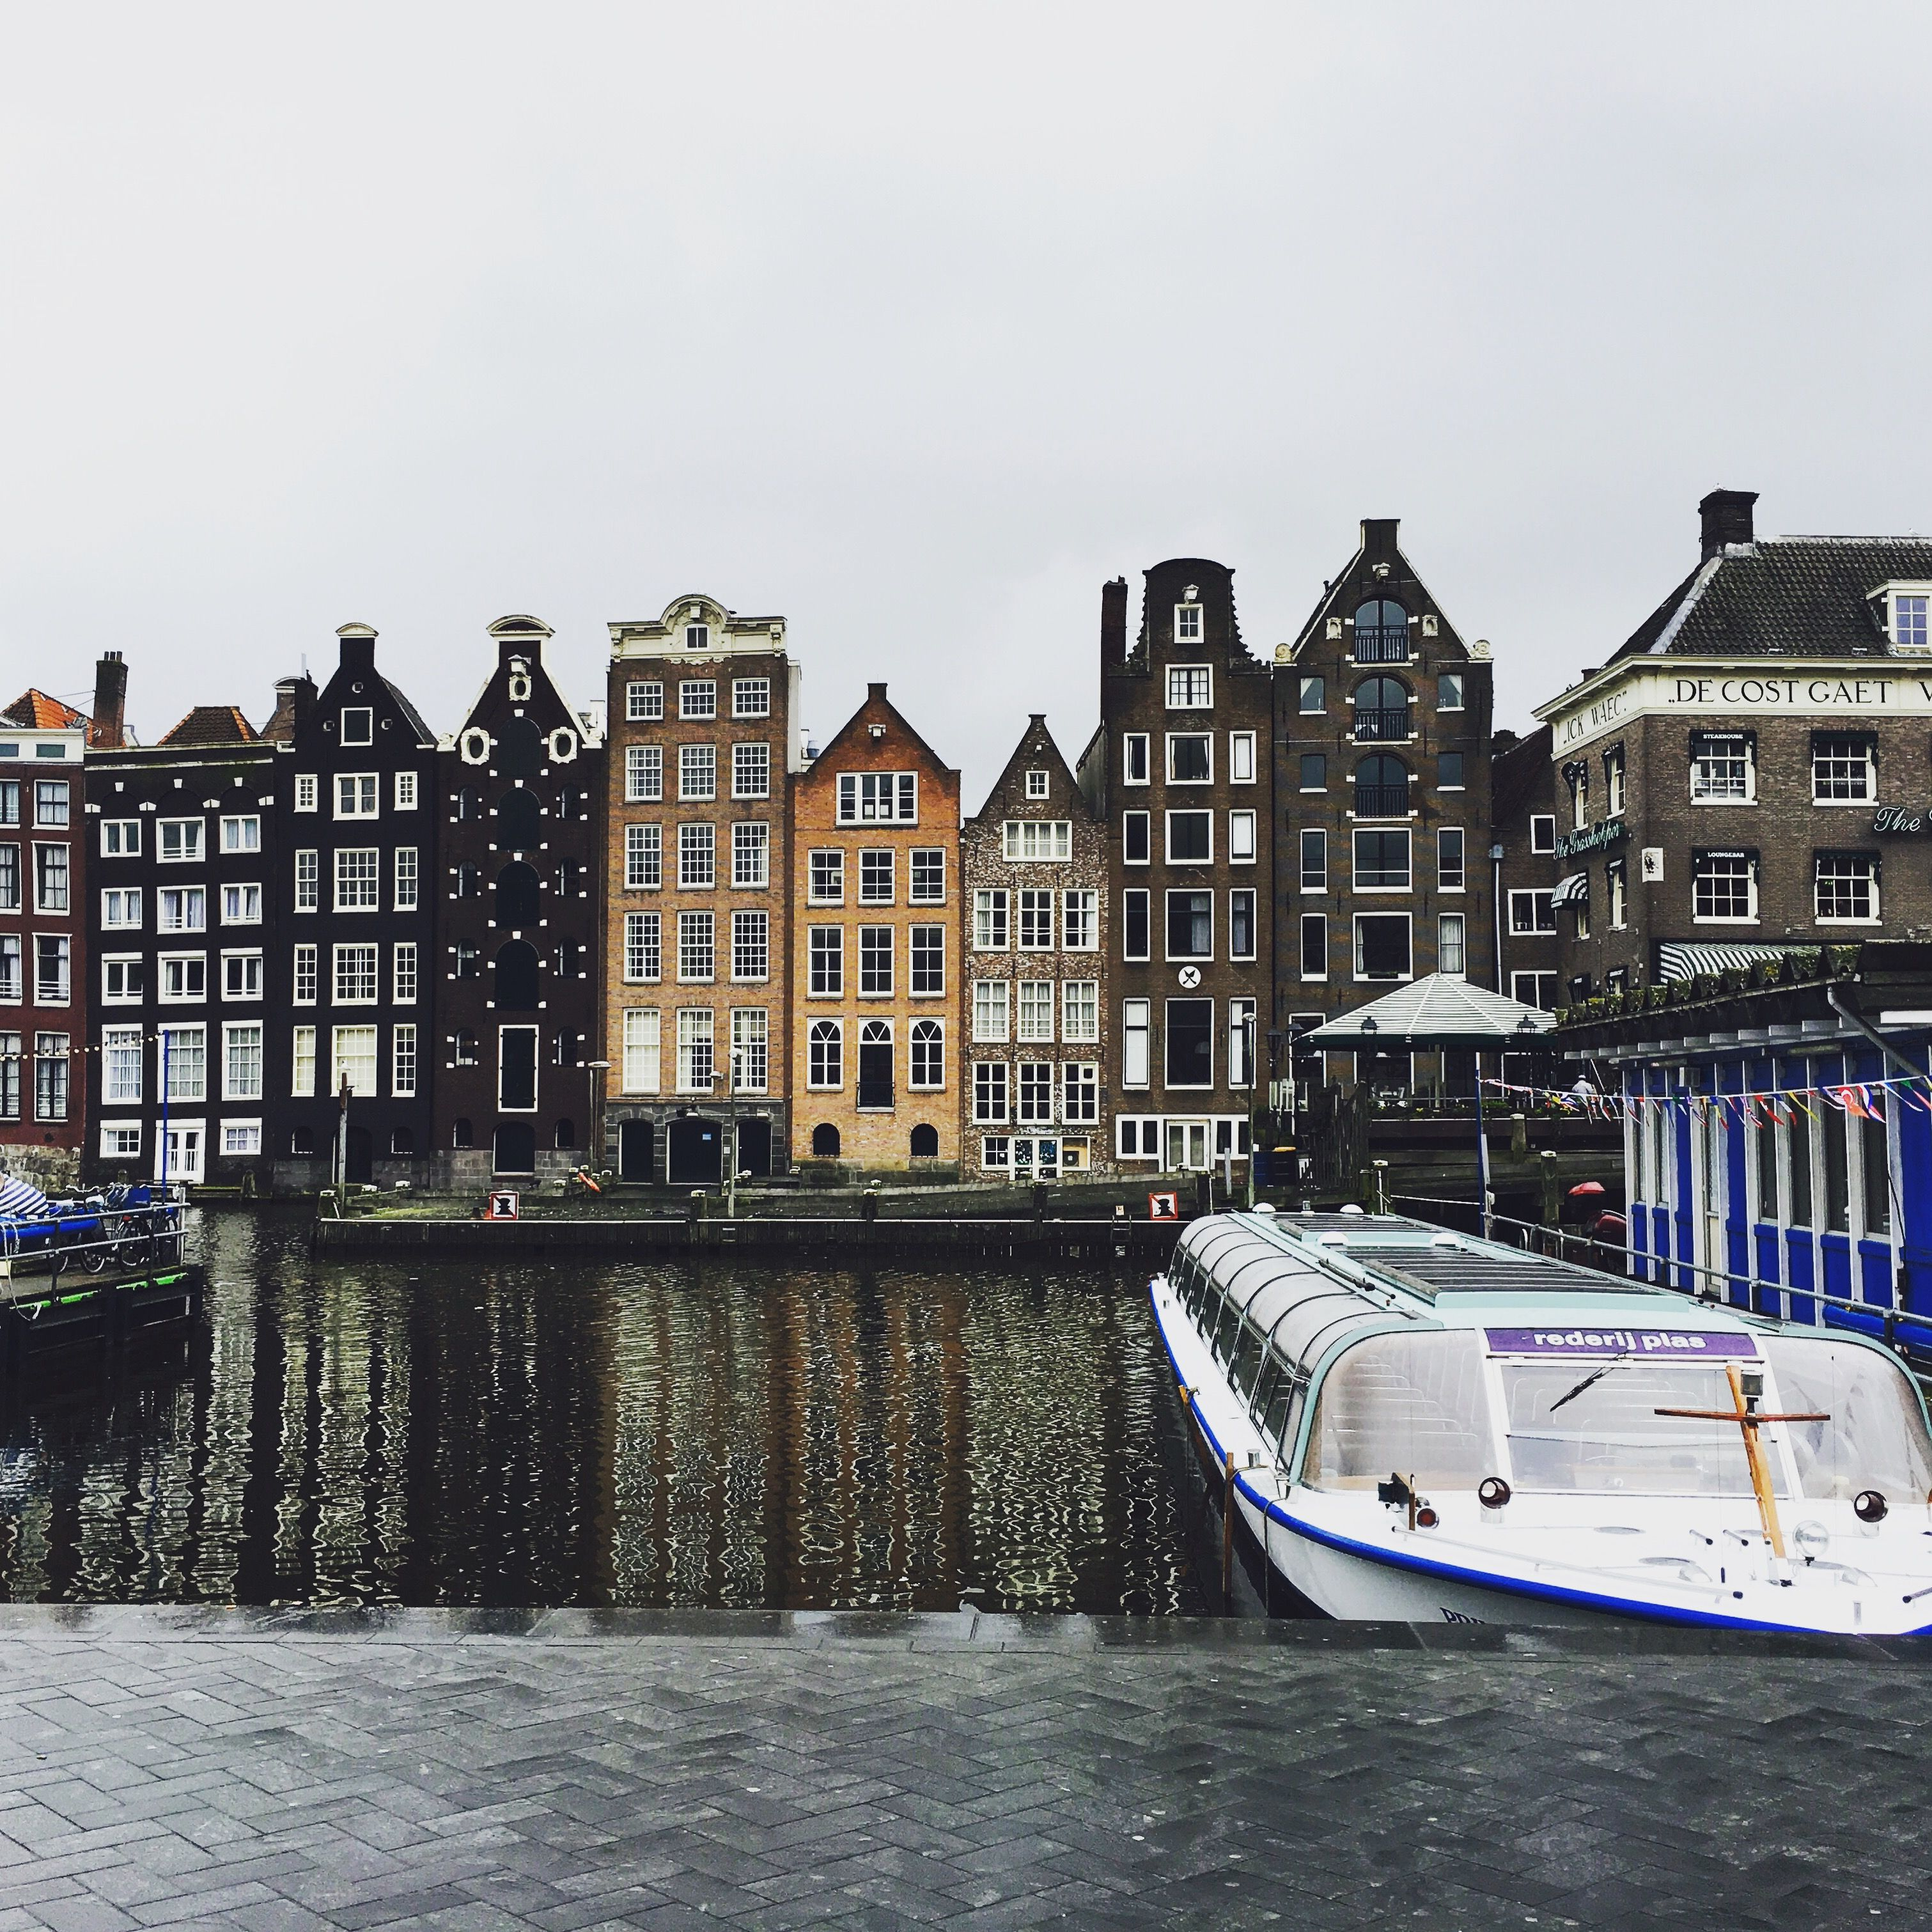 Amsterdam, Netherlands    #travel #Amsterdam #Netherlands #houses #wanderlust #adventure #canals